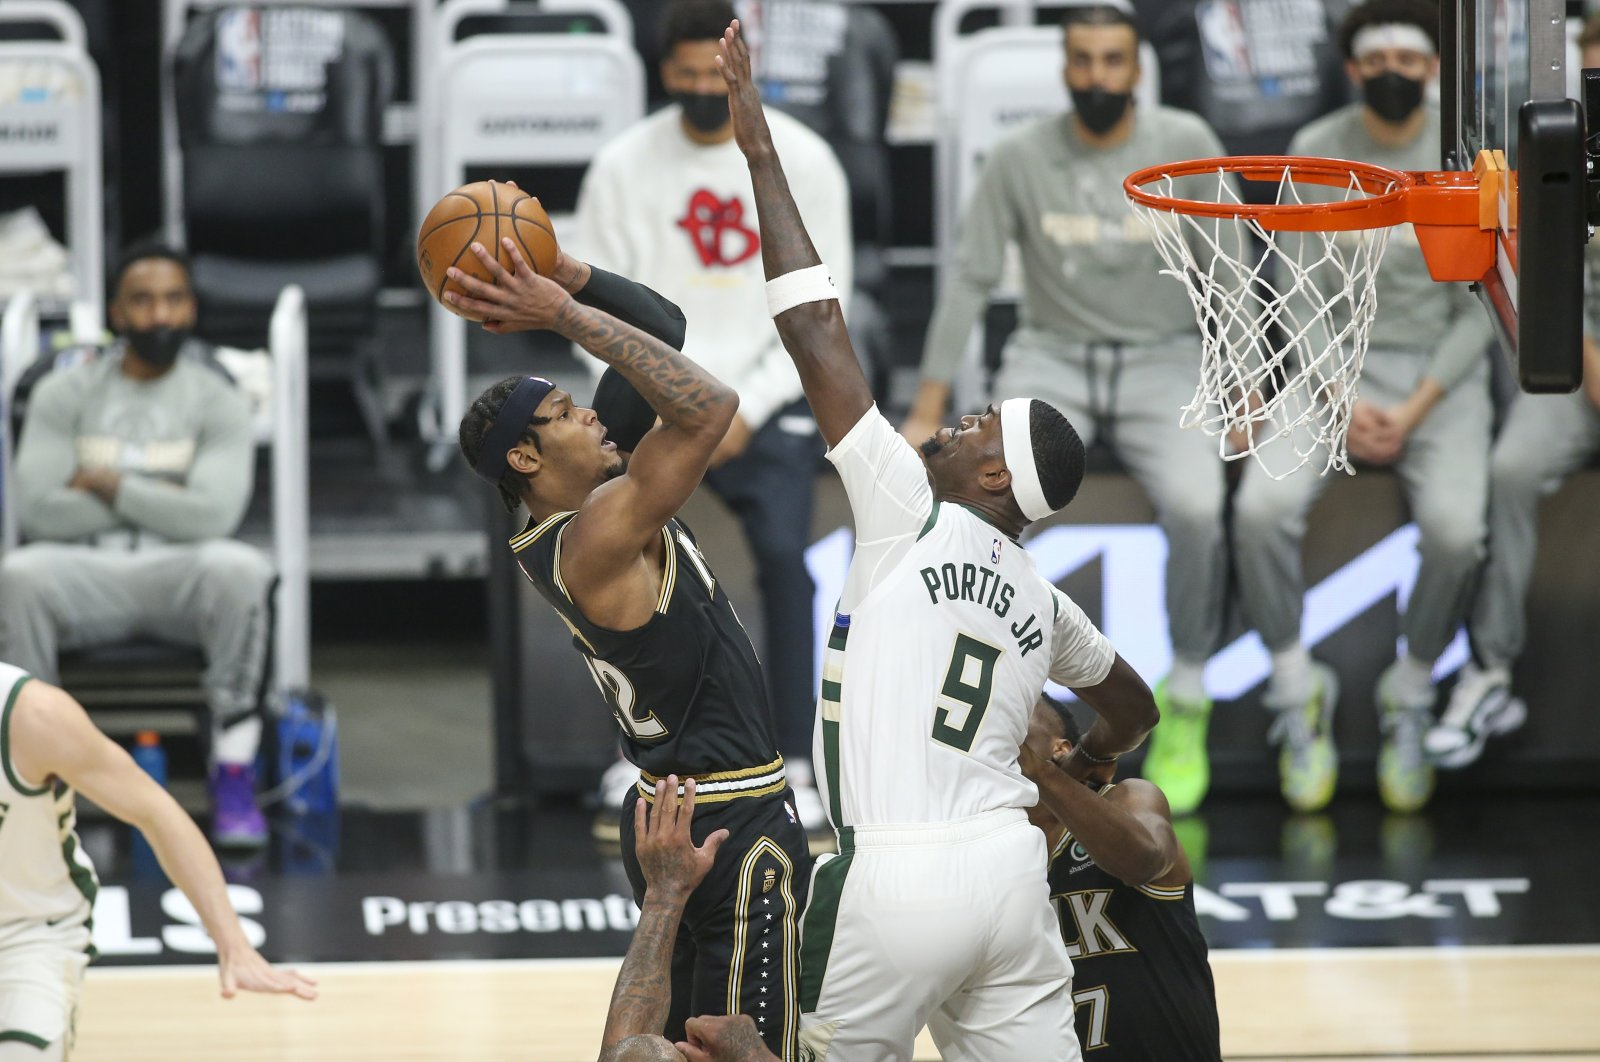 Atlanta Hawks forward Cam Reddish (L) shoots past Milwaukee Bucks center Bobby Portis during 2021 NBA Playoffs Eastern Conference Finals Game 4 at State Farm Arena, Atlanta, Georgia, U.S., Jun 29, 2021. (Reuters Photo)